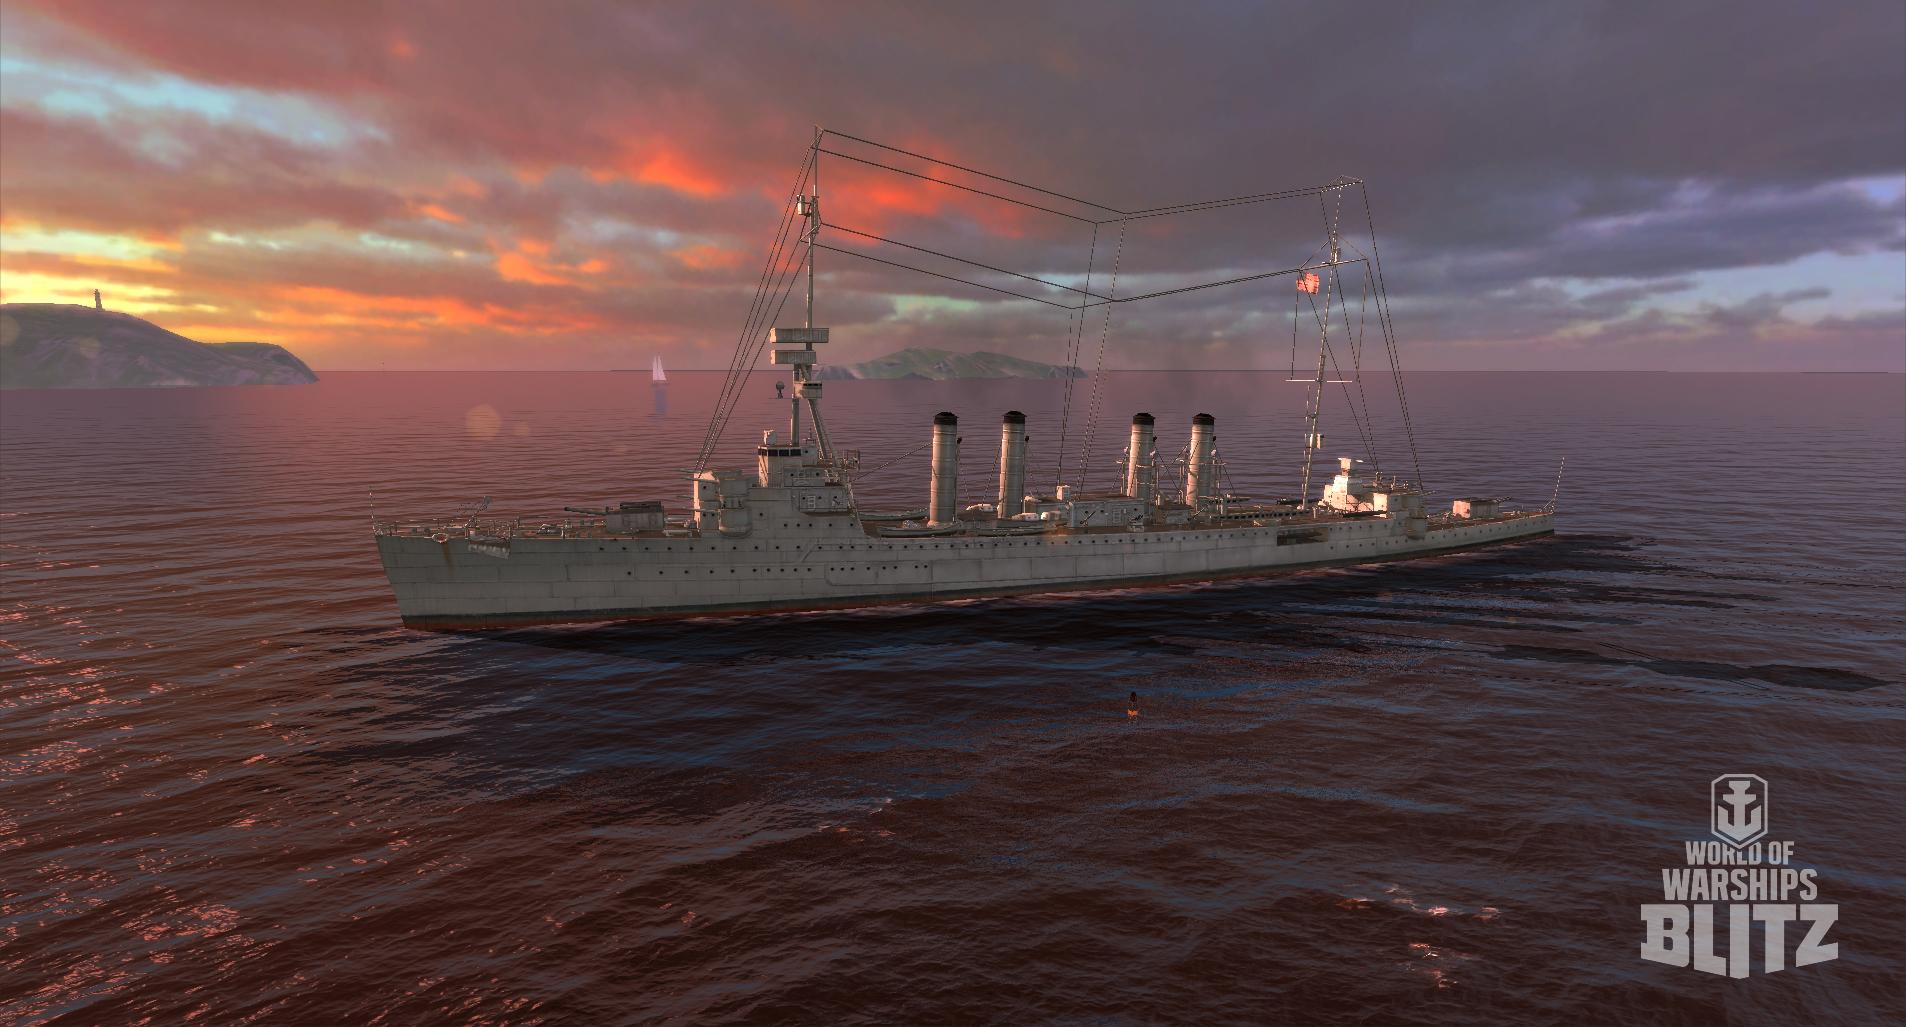 Omaha | World of Warships Blitz Wiki | FANDOM powered by Wikia